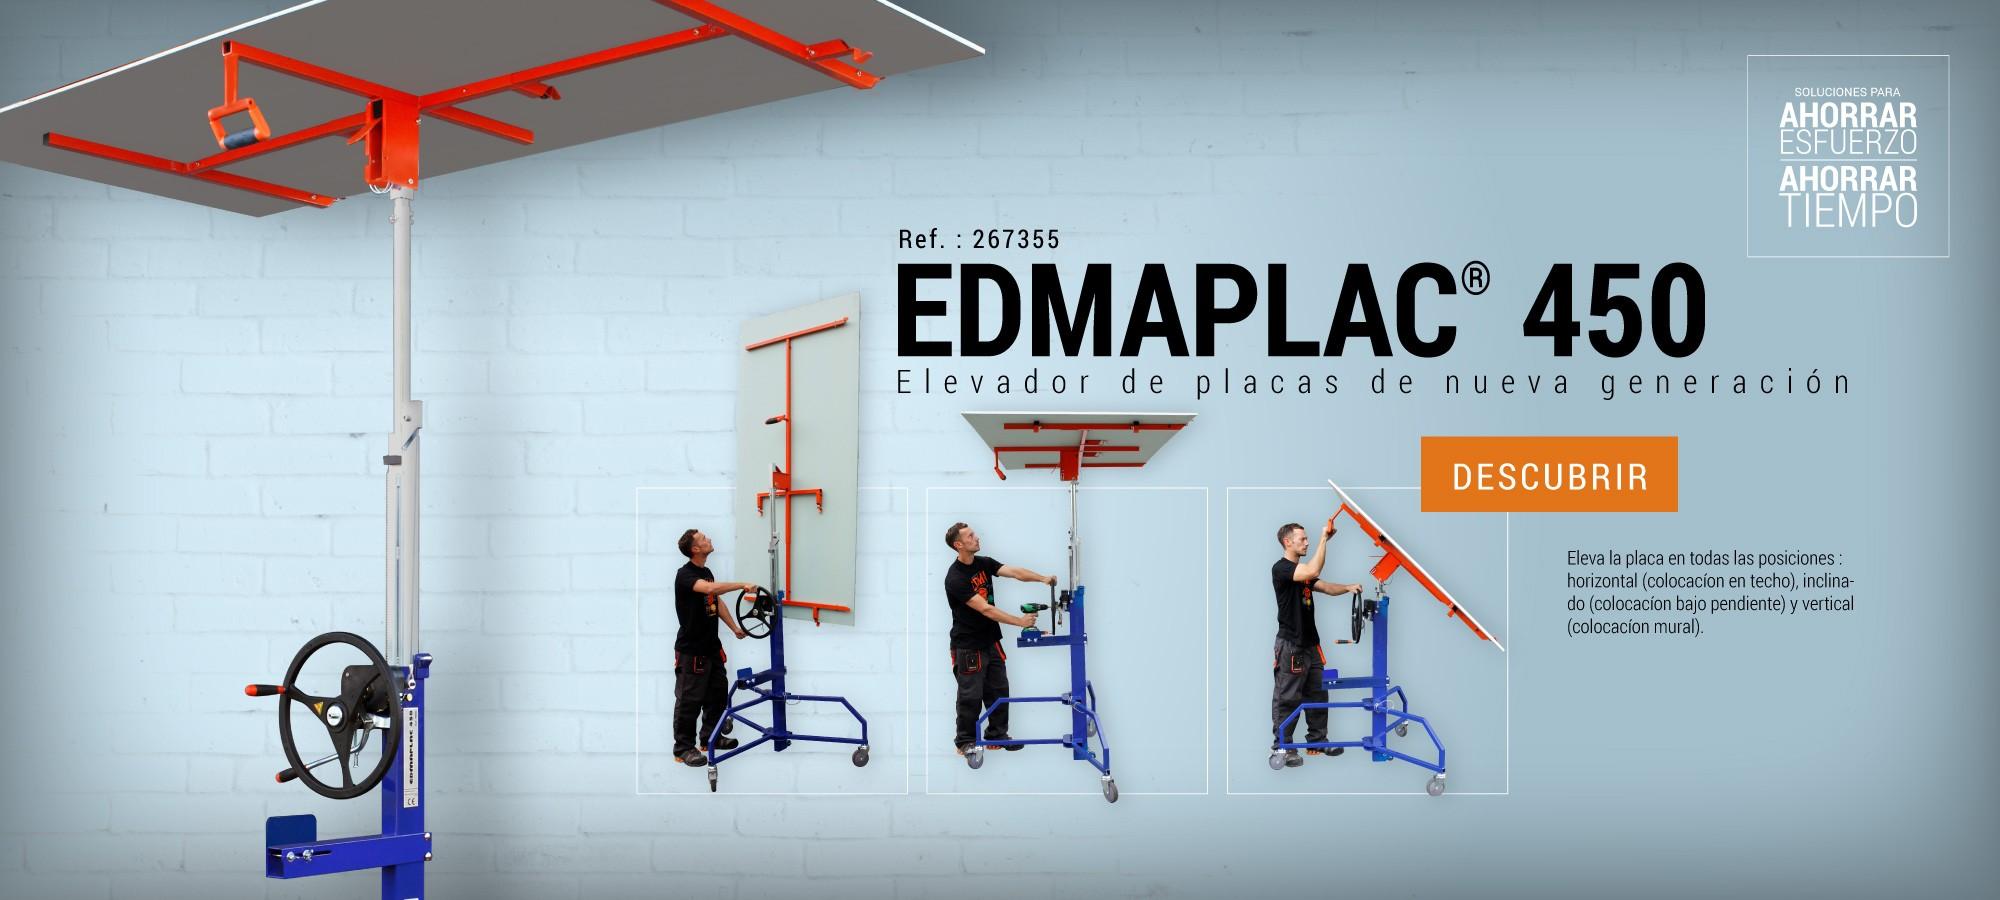 EDMAPLAC® 450